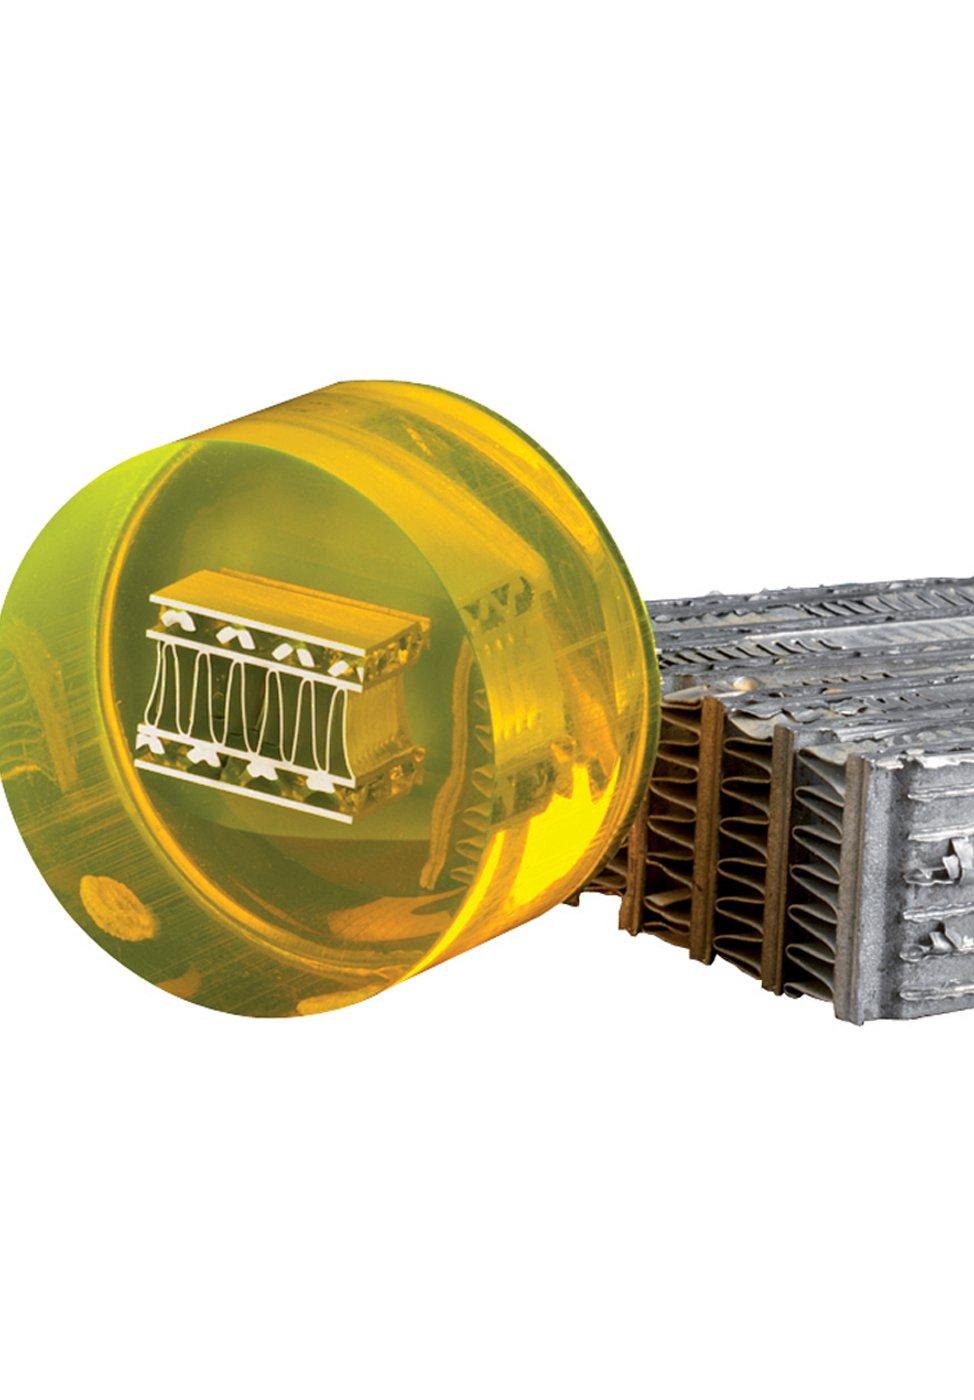 CitoVac high quality mounting